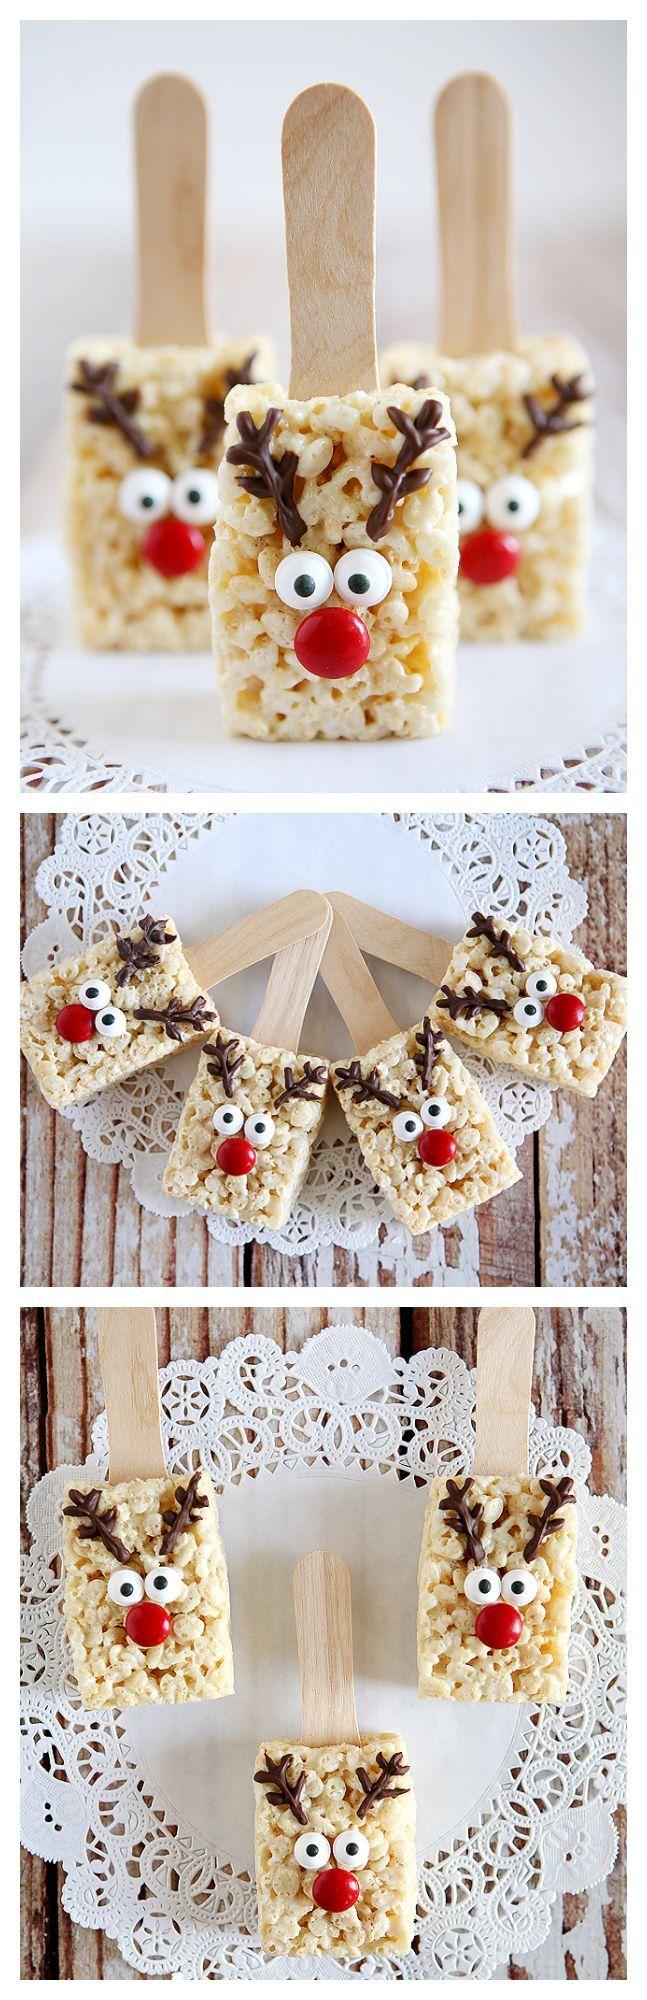 Reindeer Rice Krispies Treats | Christmas Treats #RiceKrispies #Treats #Christmas